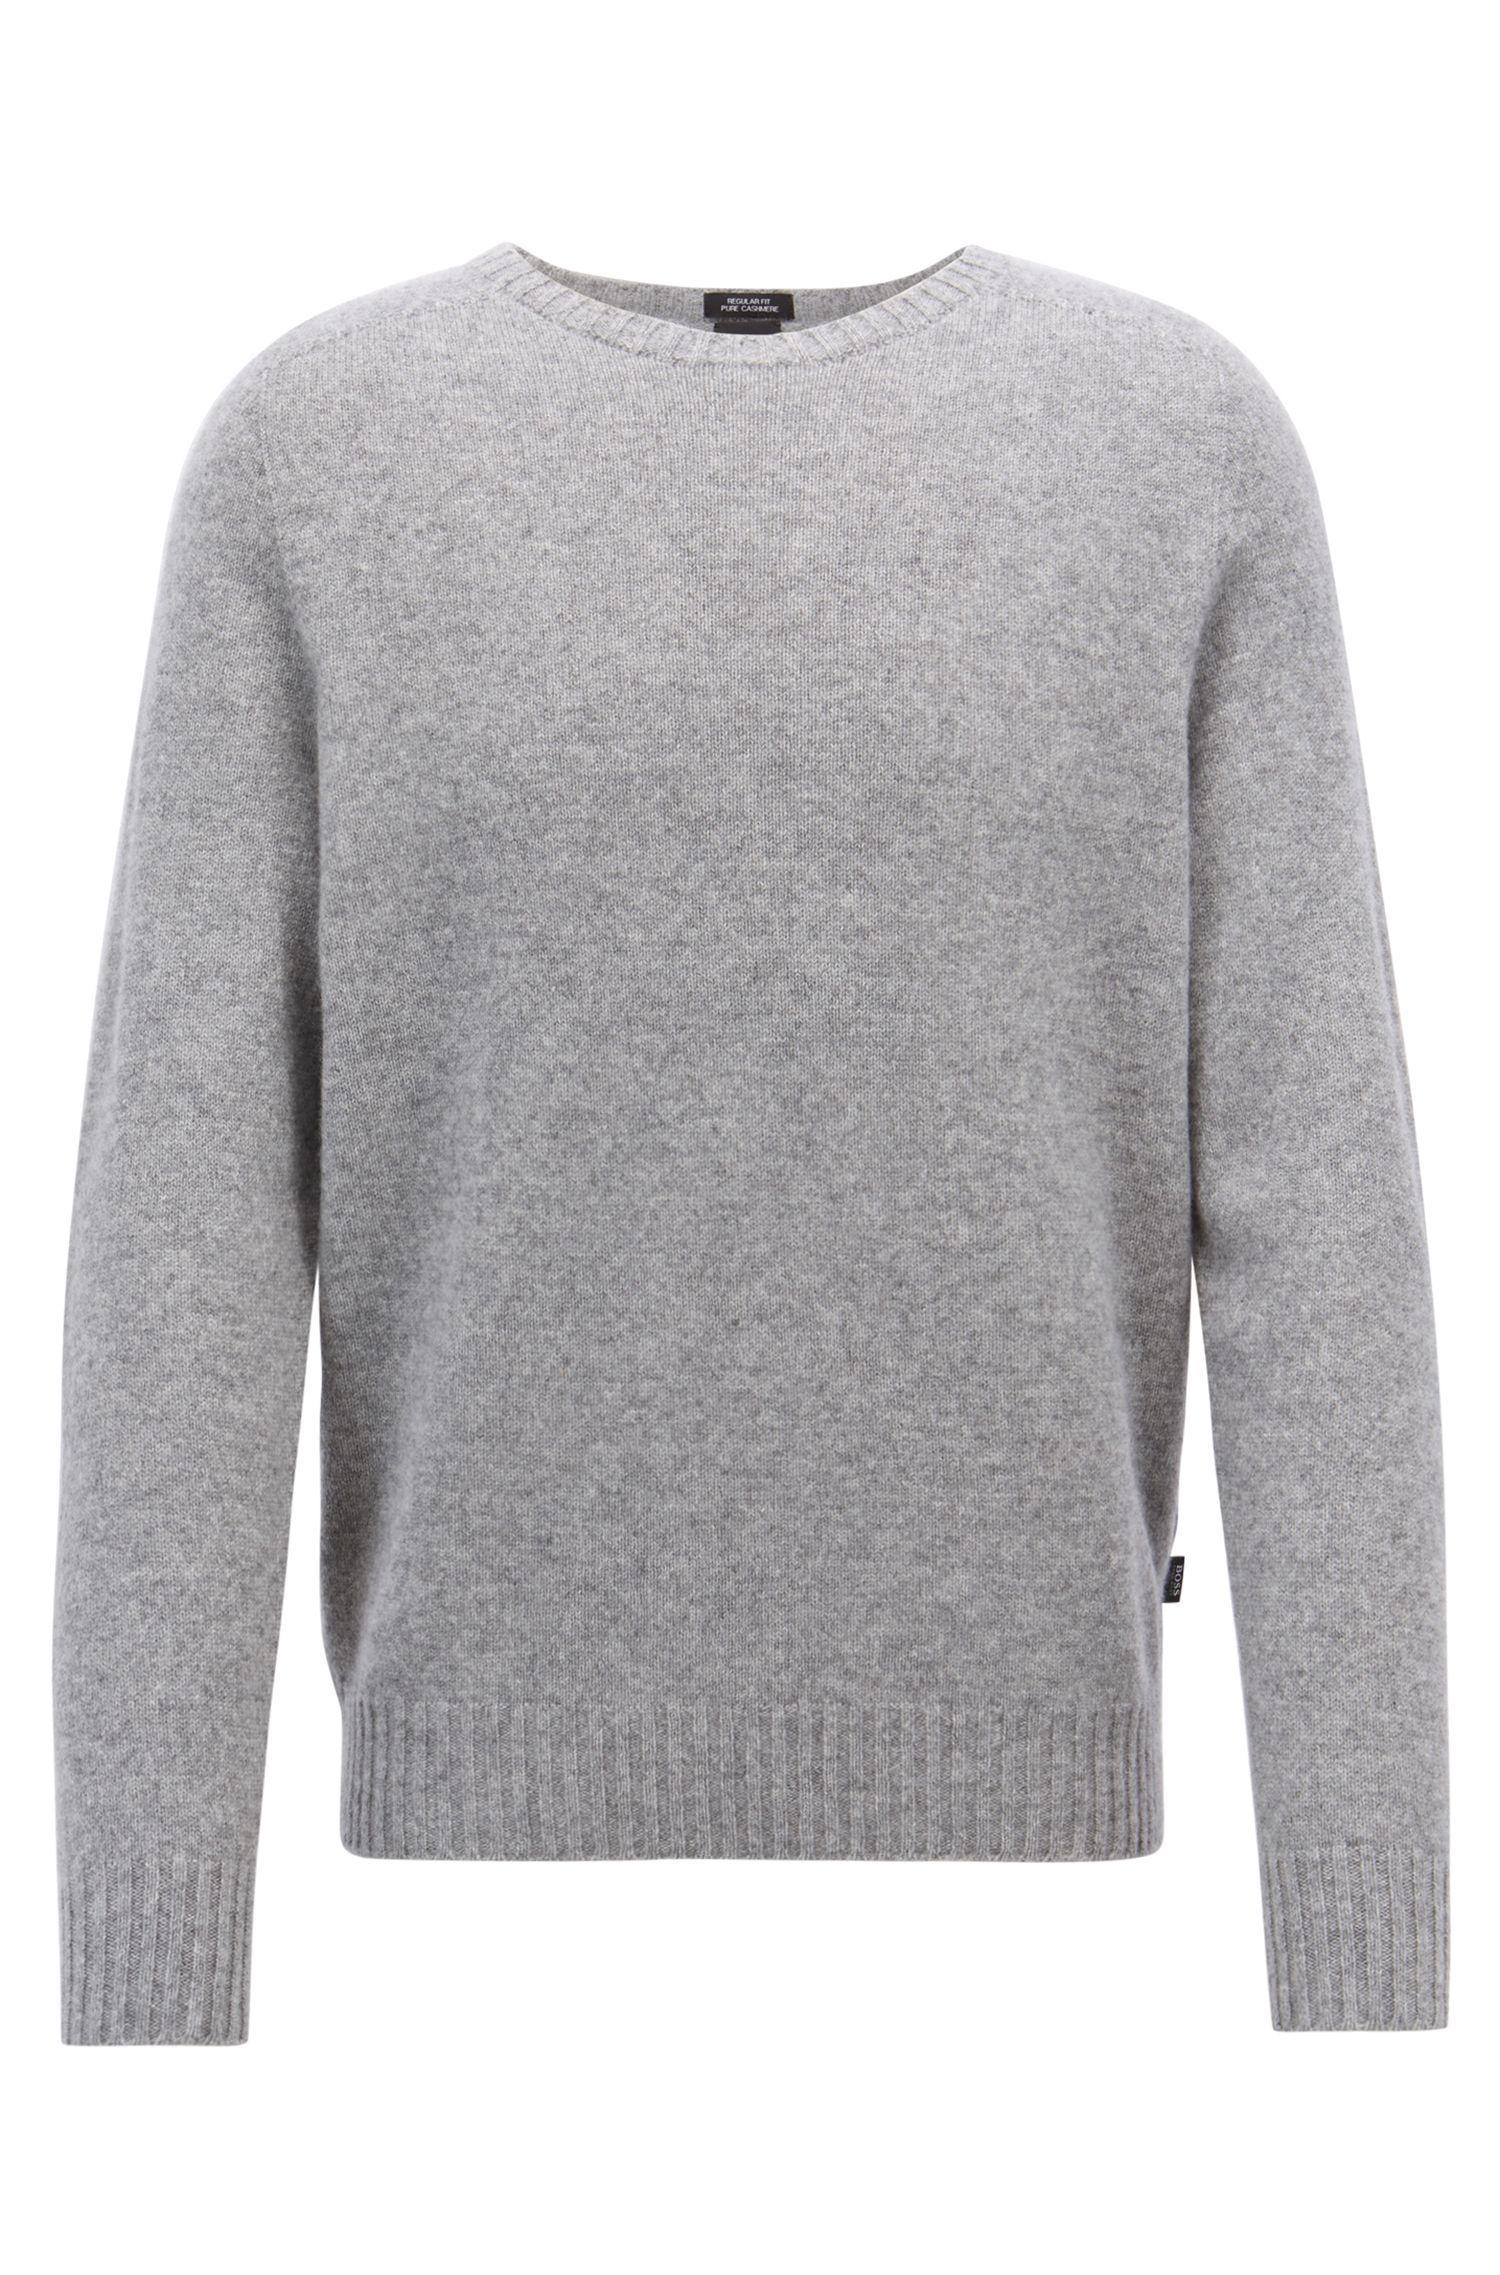 Cashmere sweater with seam-free design, Silver